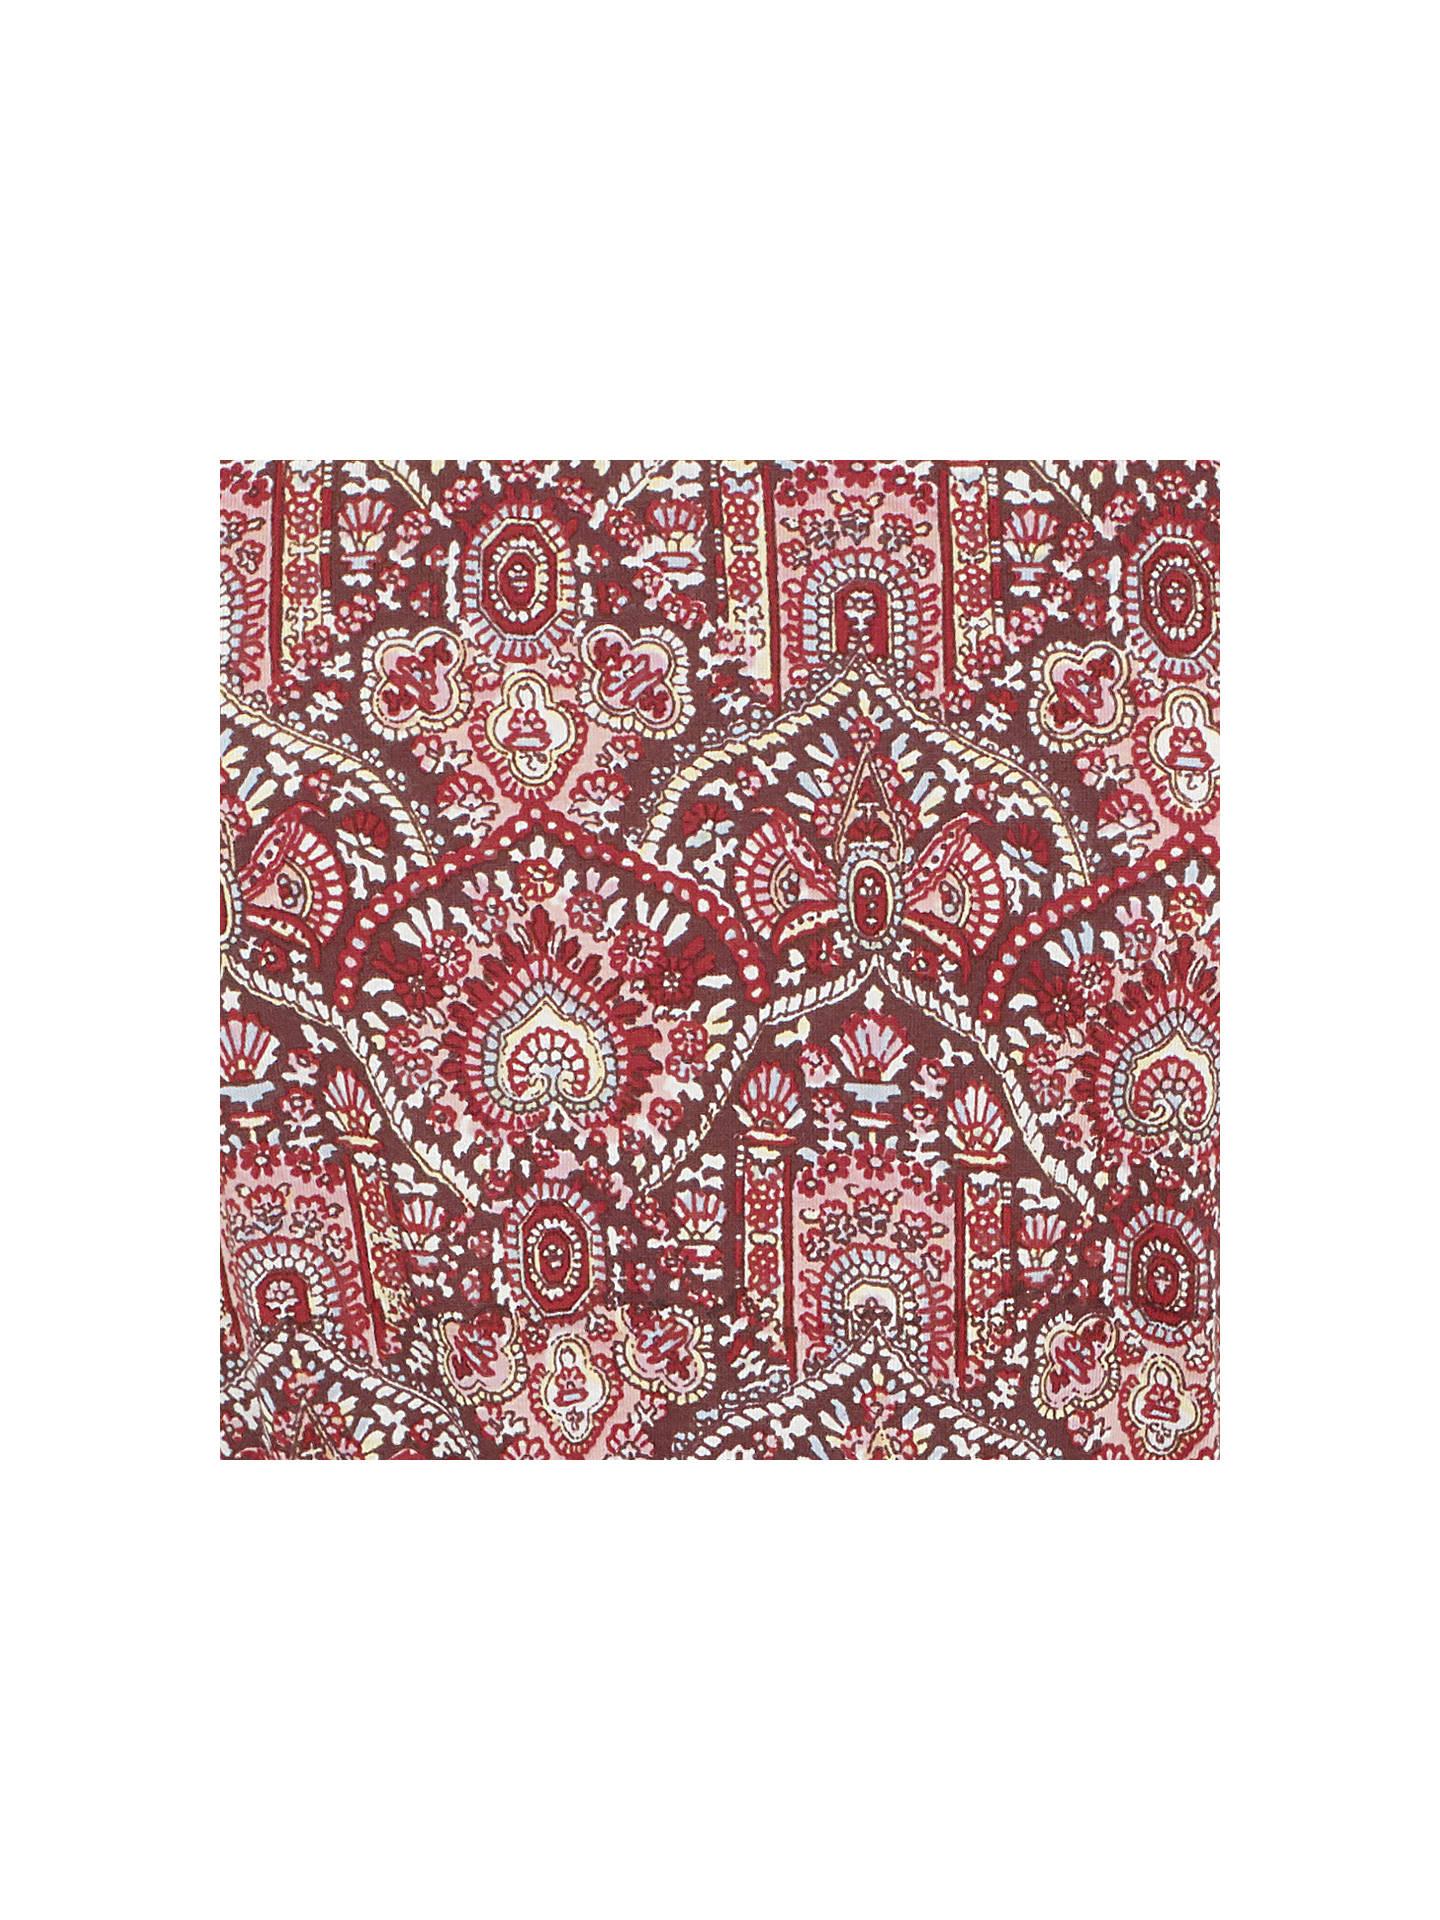 16af821ac60c Buy Fat Face Rosa Indian Summer Dress, Rustic Red, 6 Online at johnlewis.